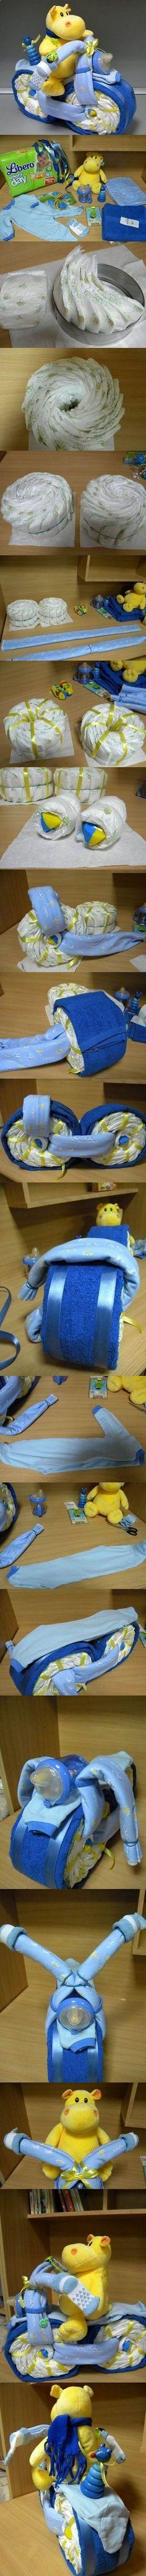 DIY Hippo on the Bike Diaper Gift | iCreativeIdeas.com LIKE Us on Facebook ==> https://www.facebook.com/icreativeideas